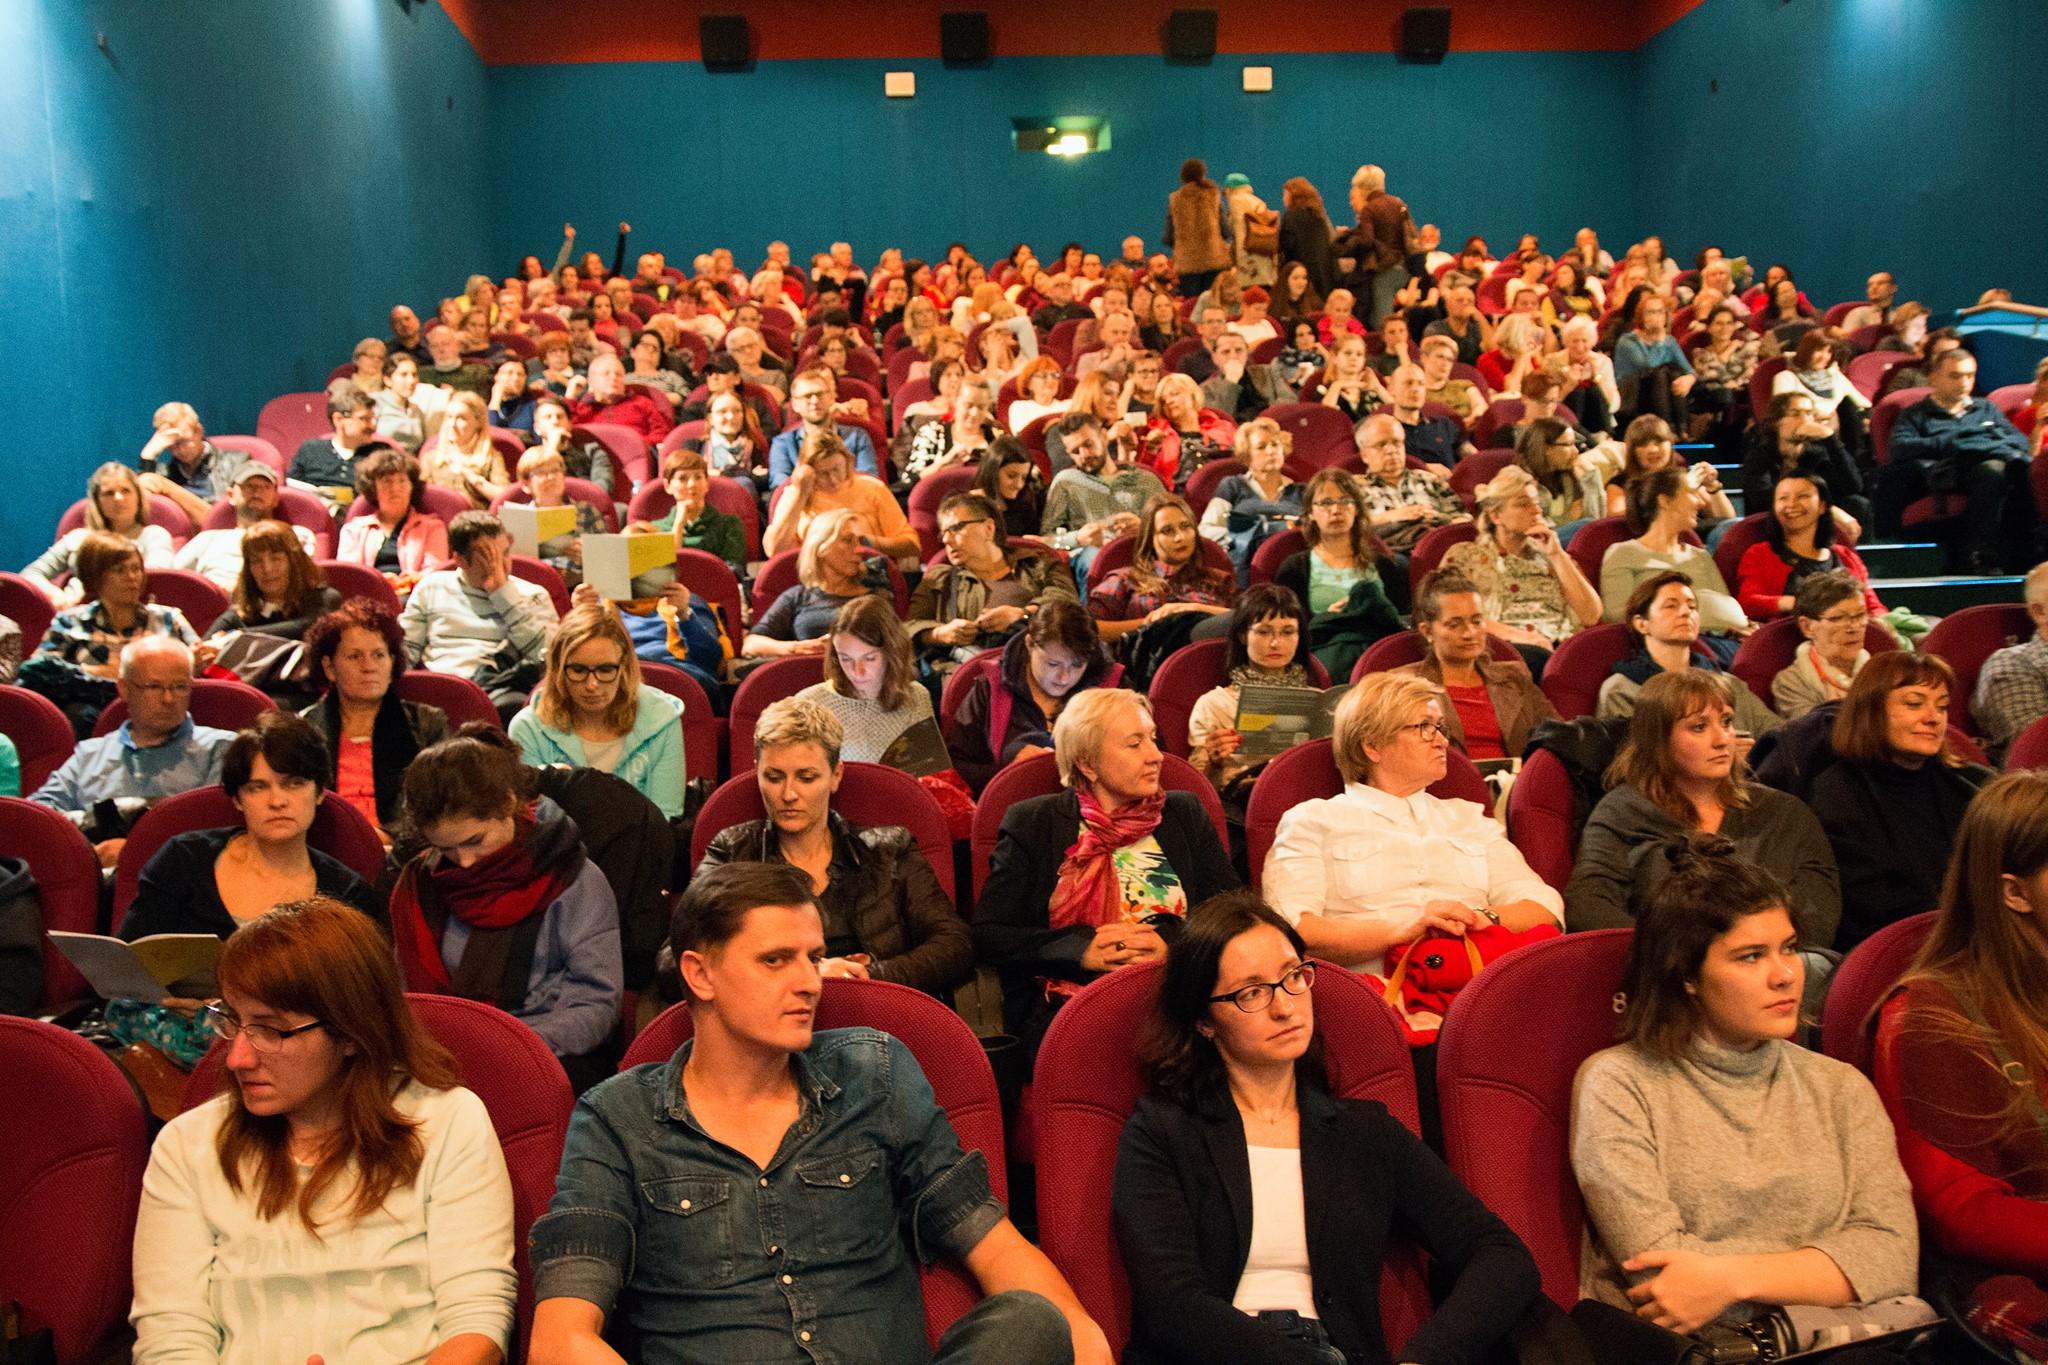 festiwal filmowy opolskie lamy 16 (5)